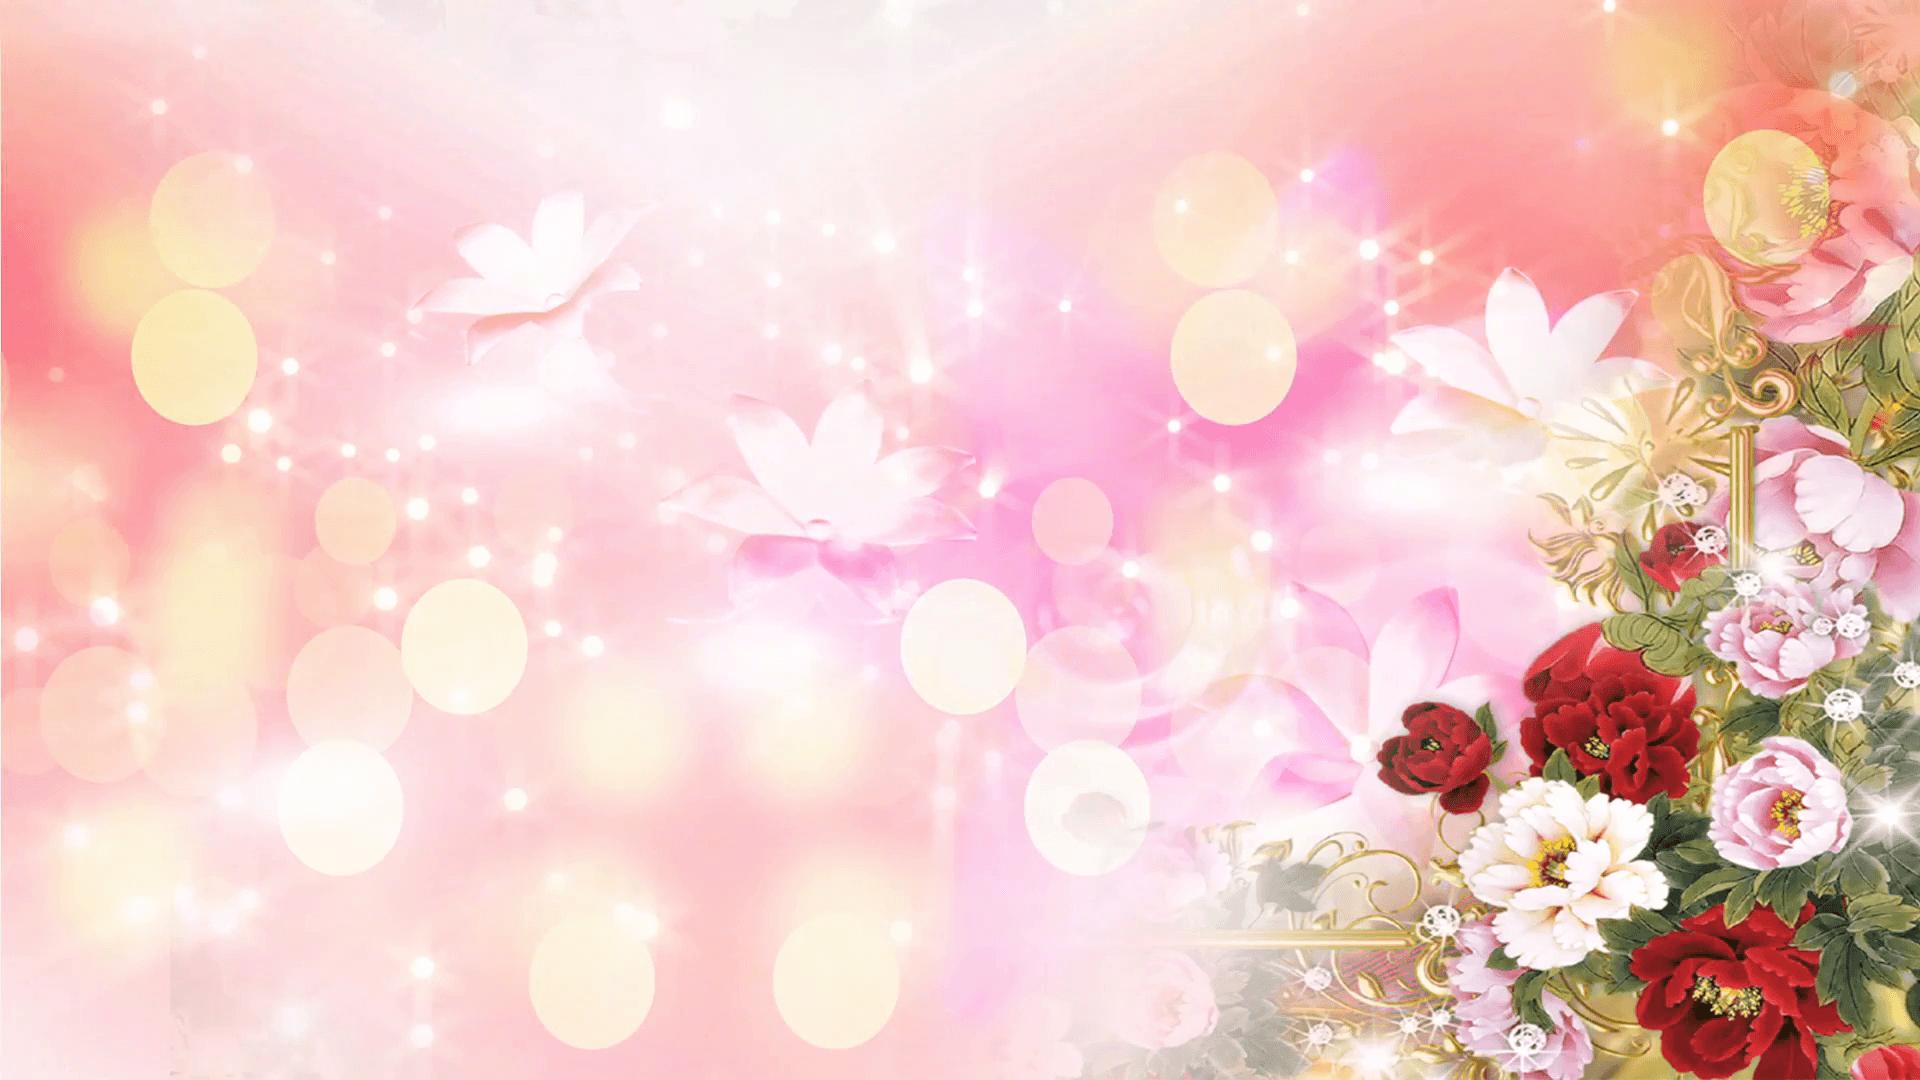 Hd Wedding Backgrounds 78 Wallpapers Hd Wallpapers Ramki Fon